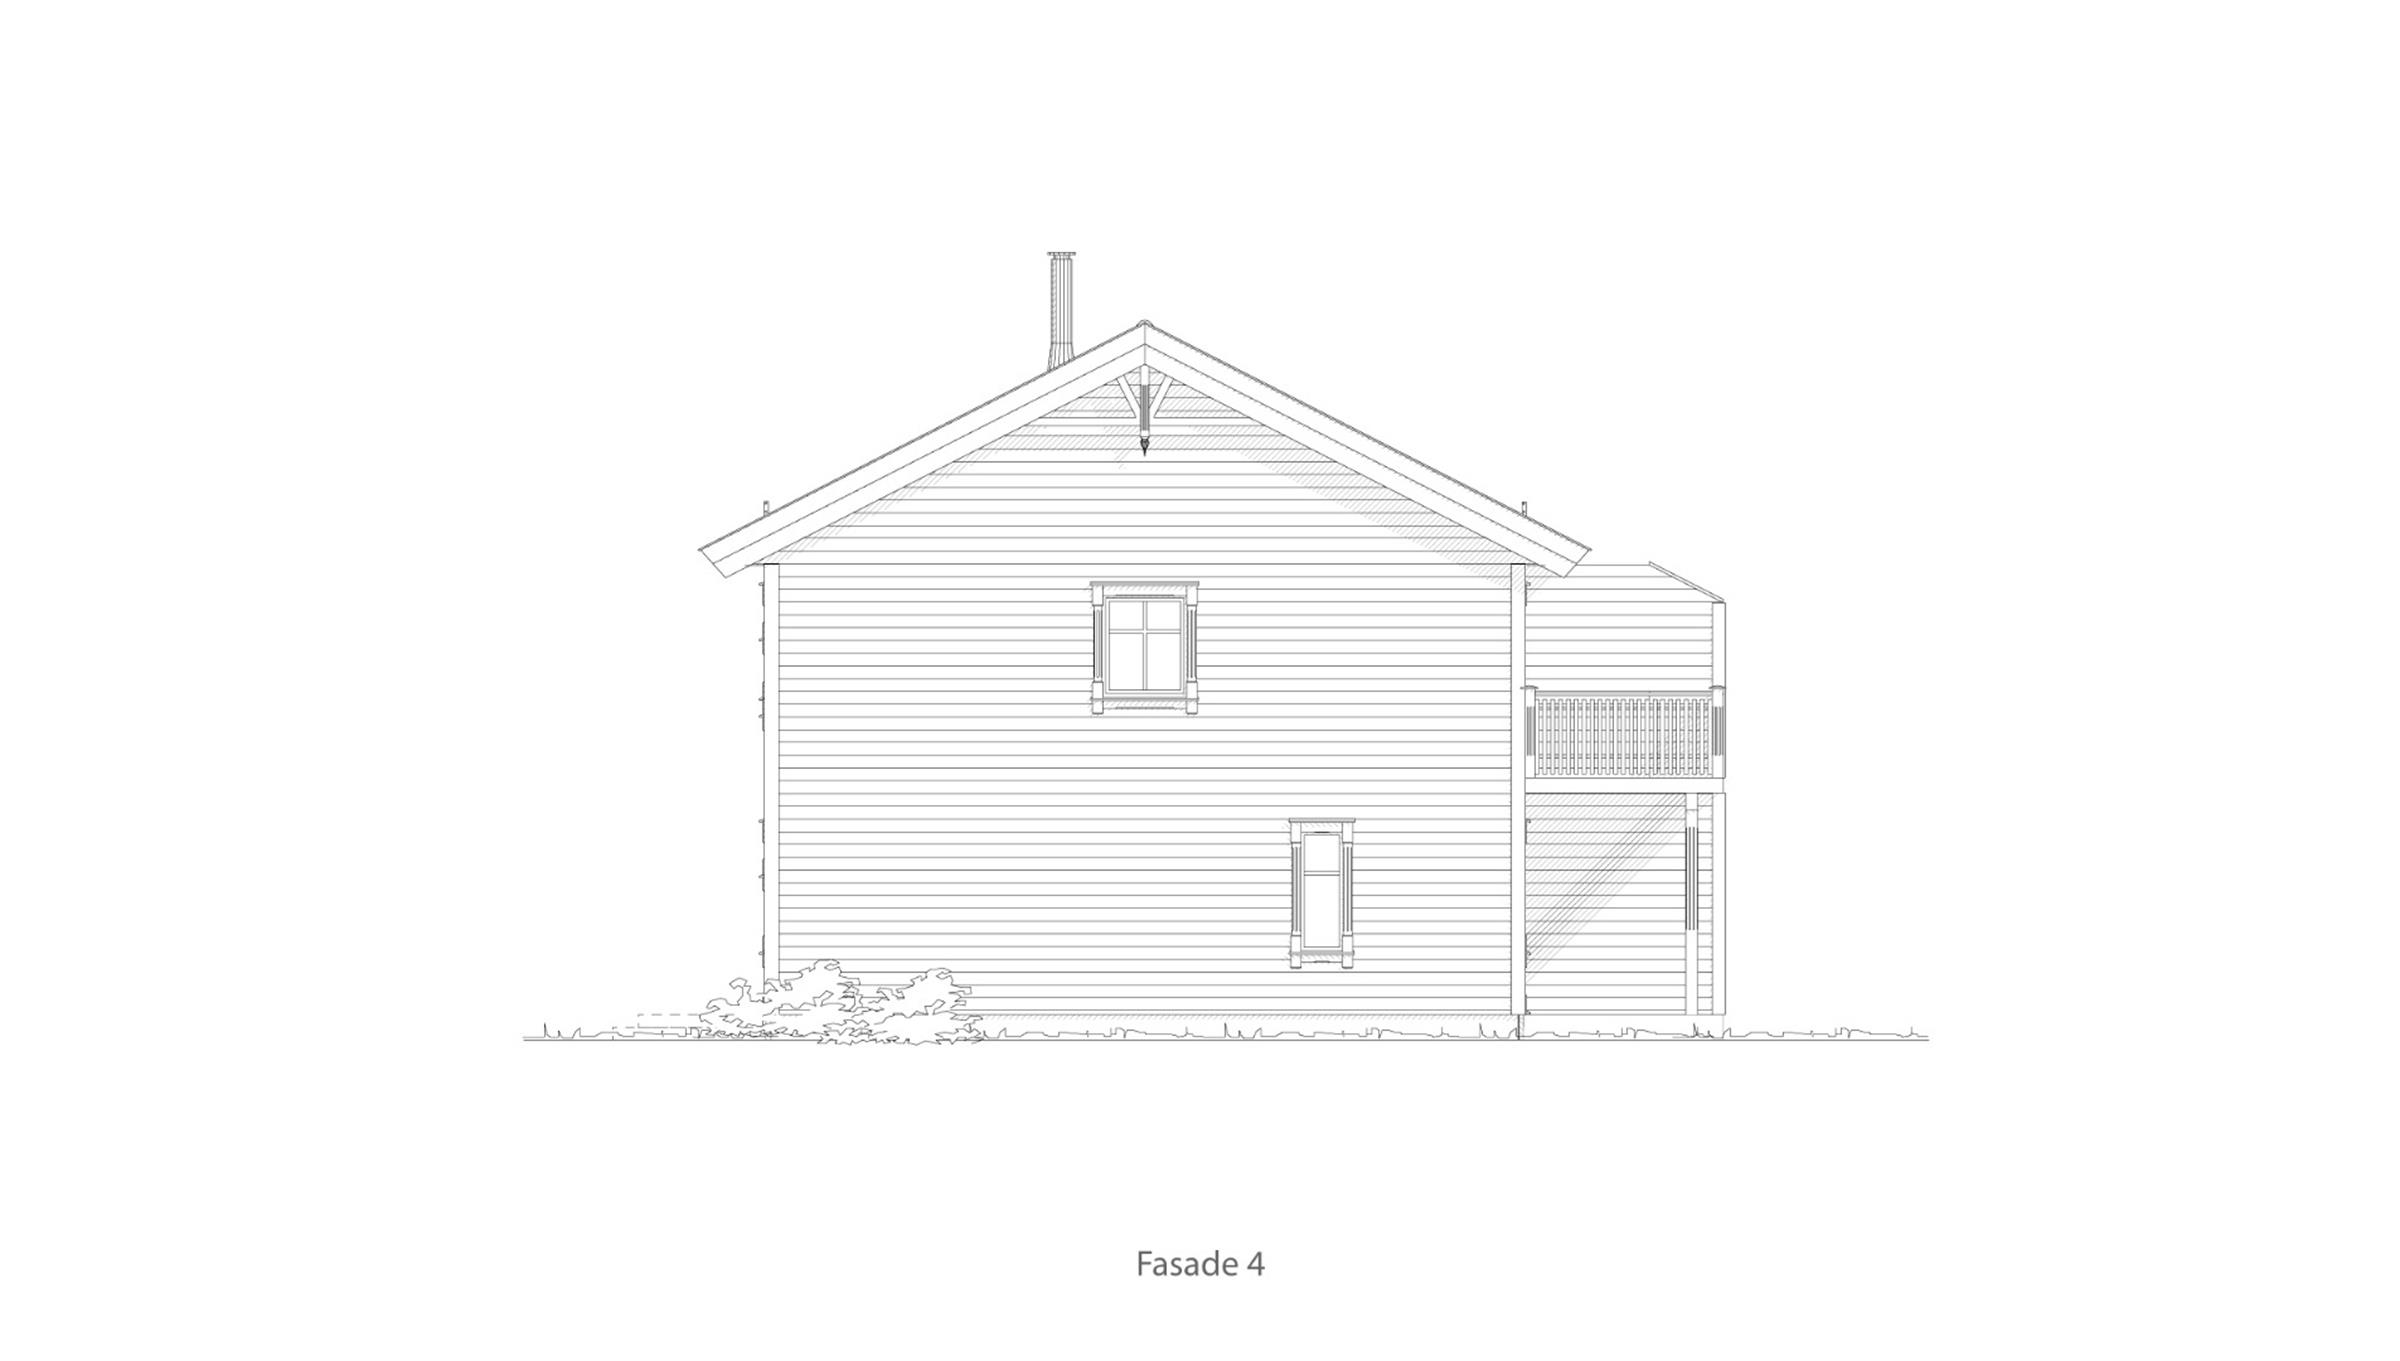 Hamar fasade 4